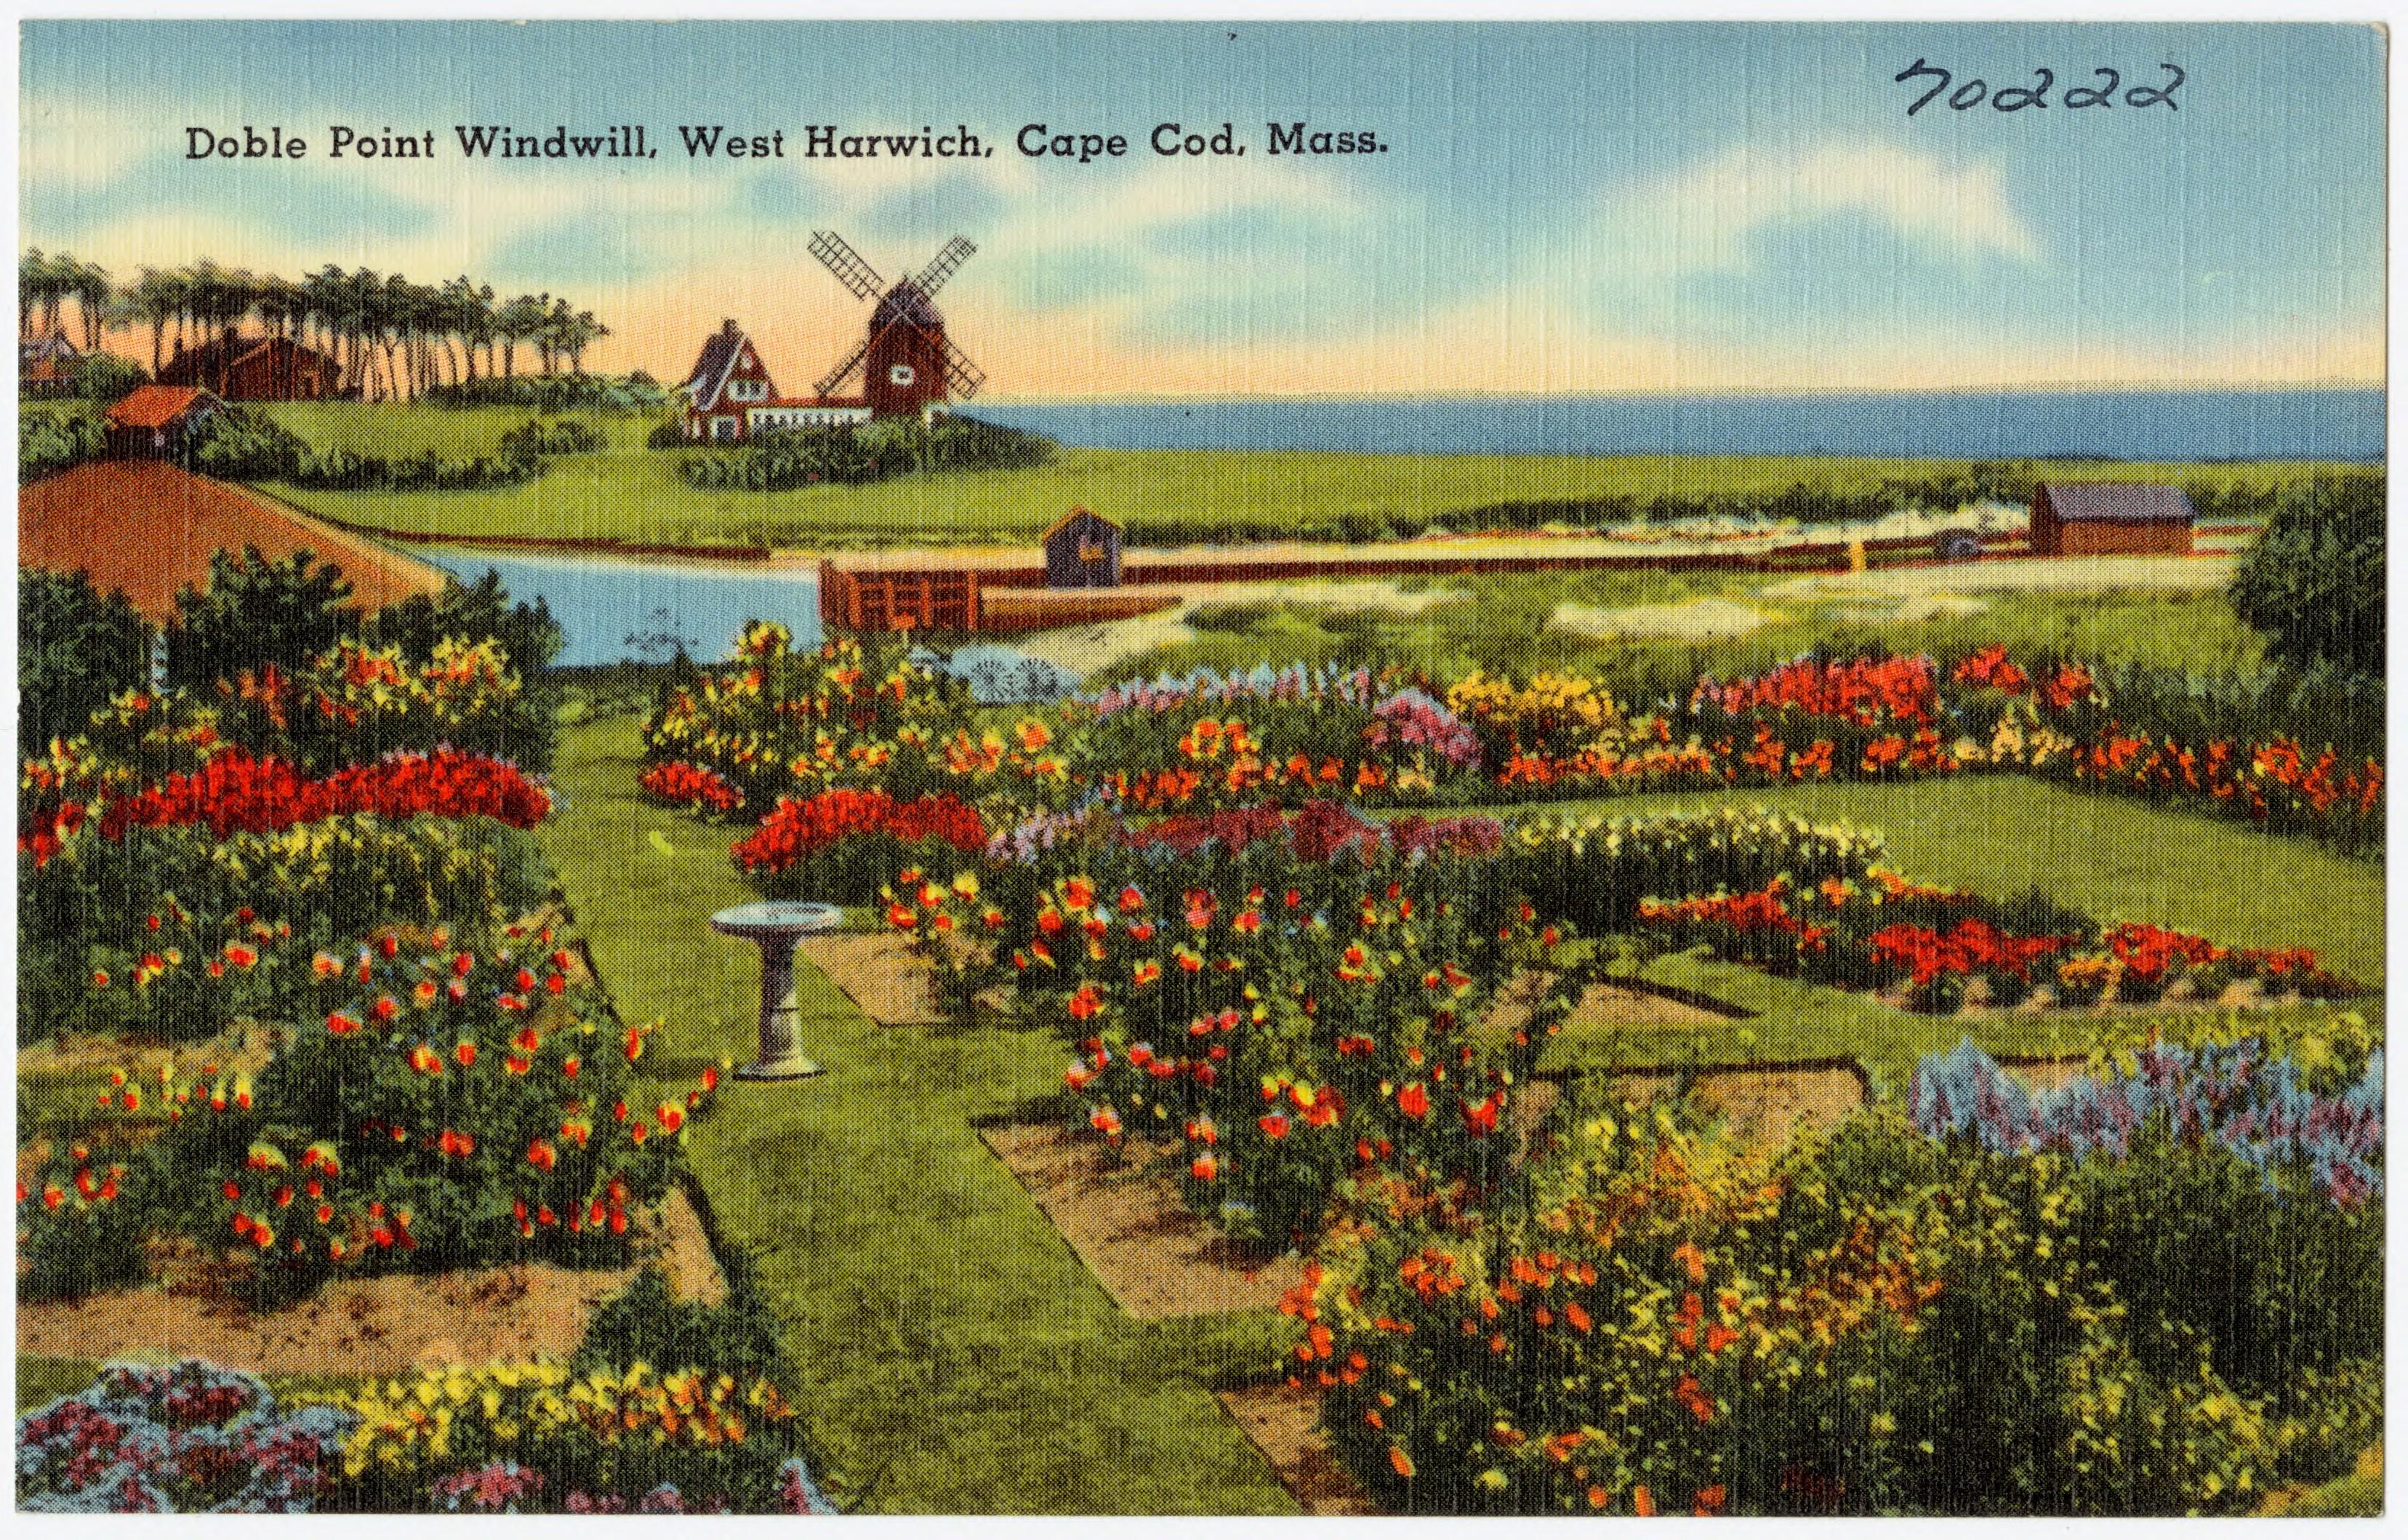 File:Doble Point Windmill, West Harwich, Cape Cod, Mass (70222).jpg ...